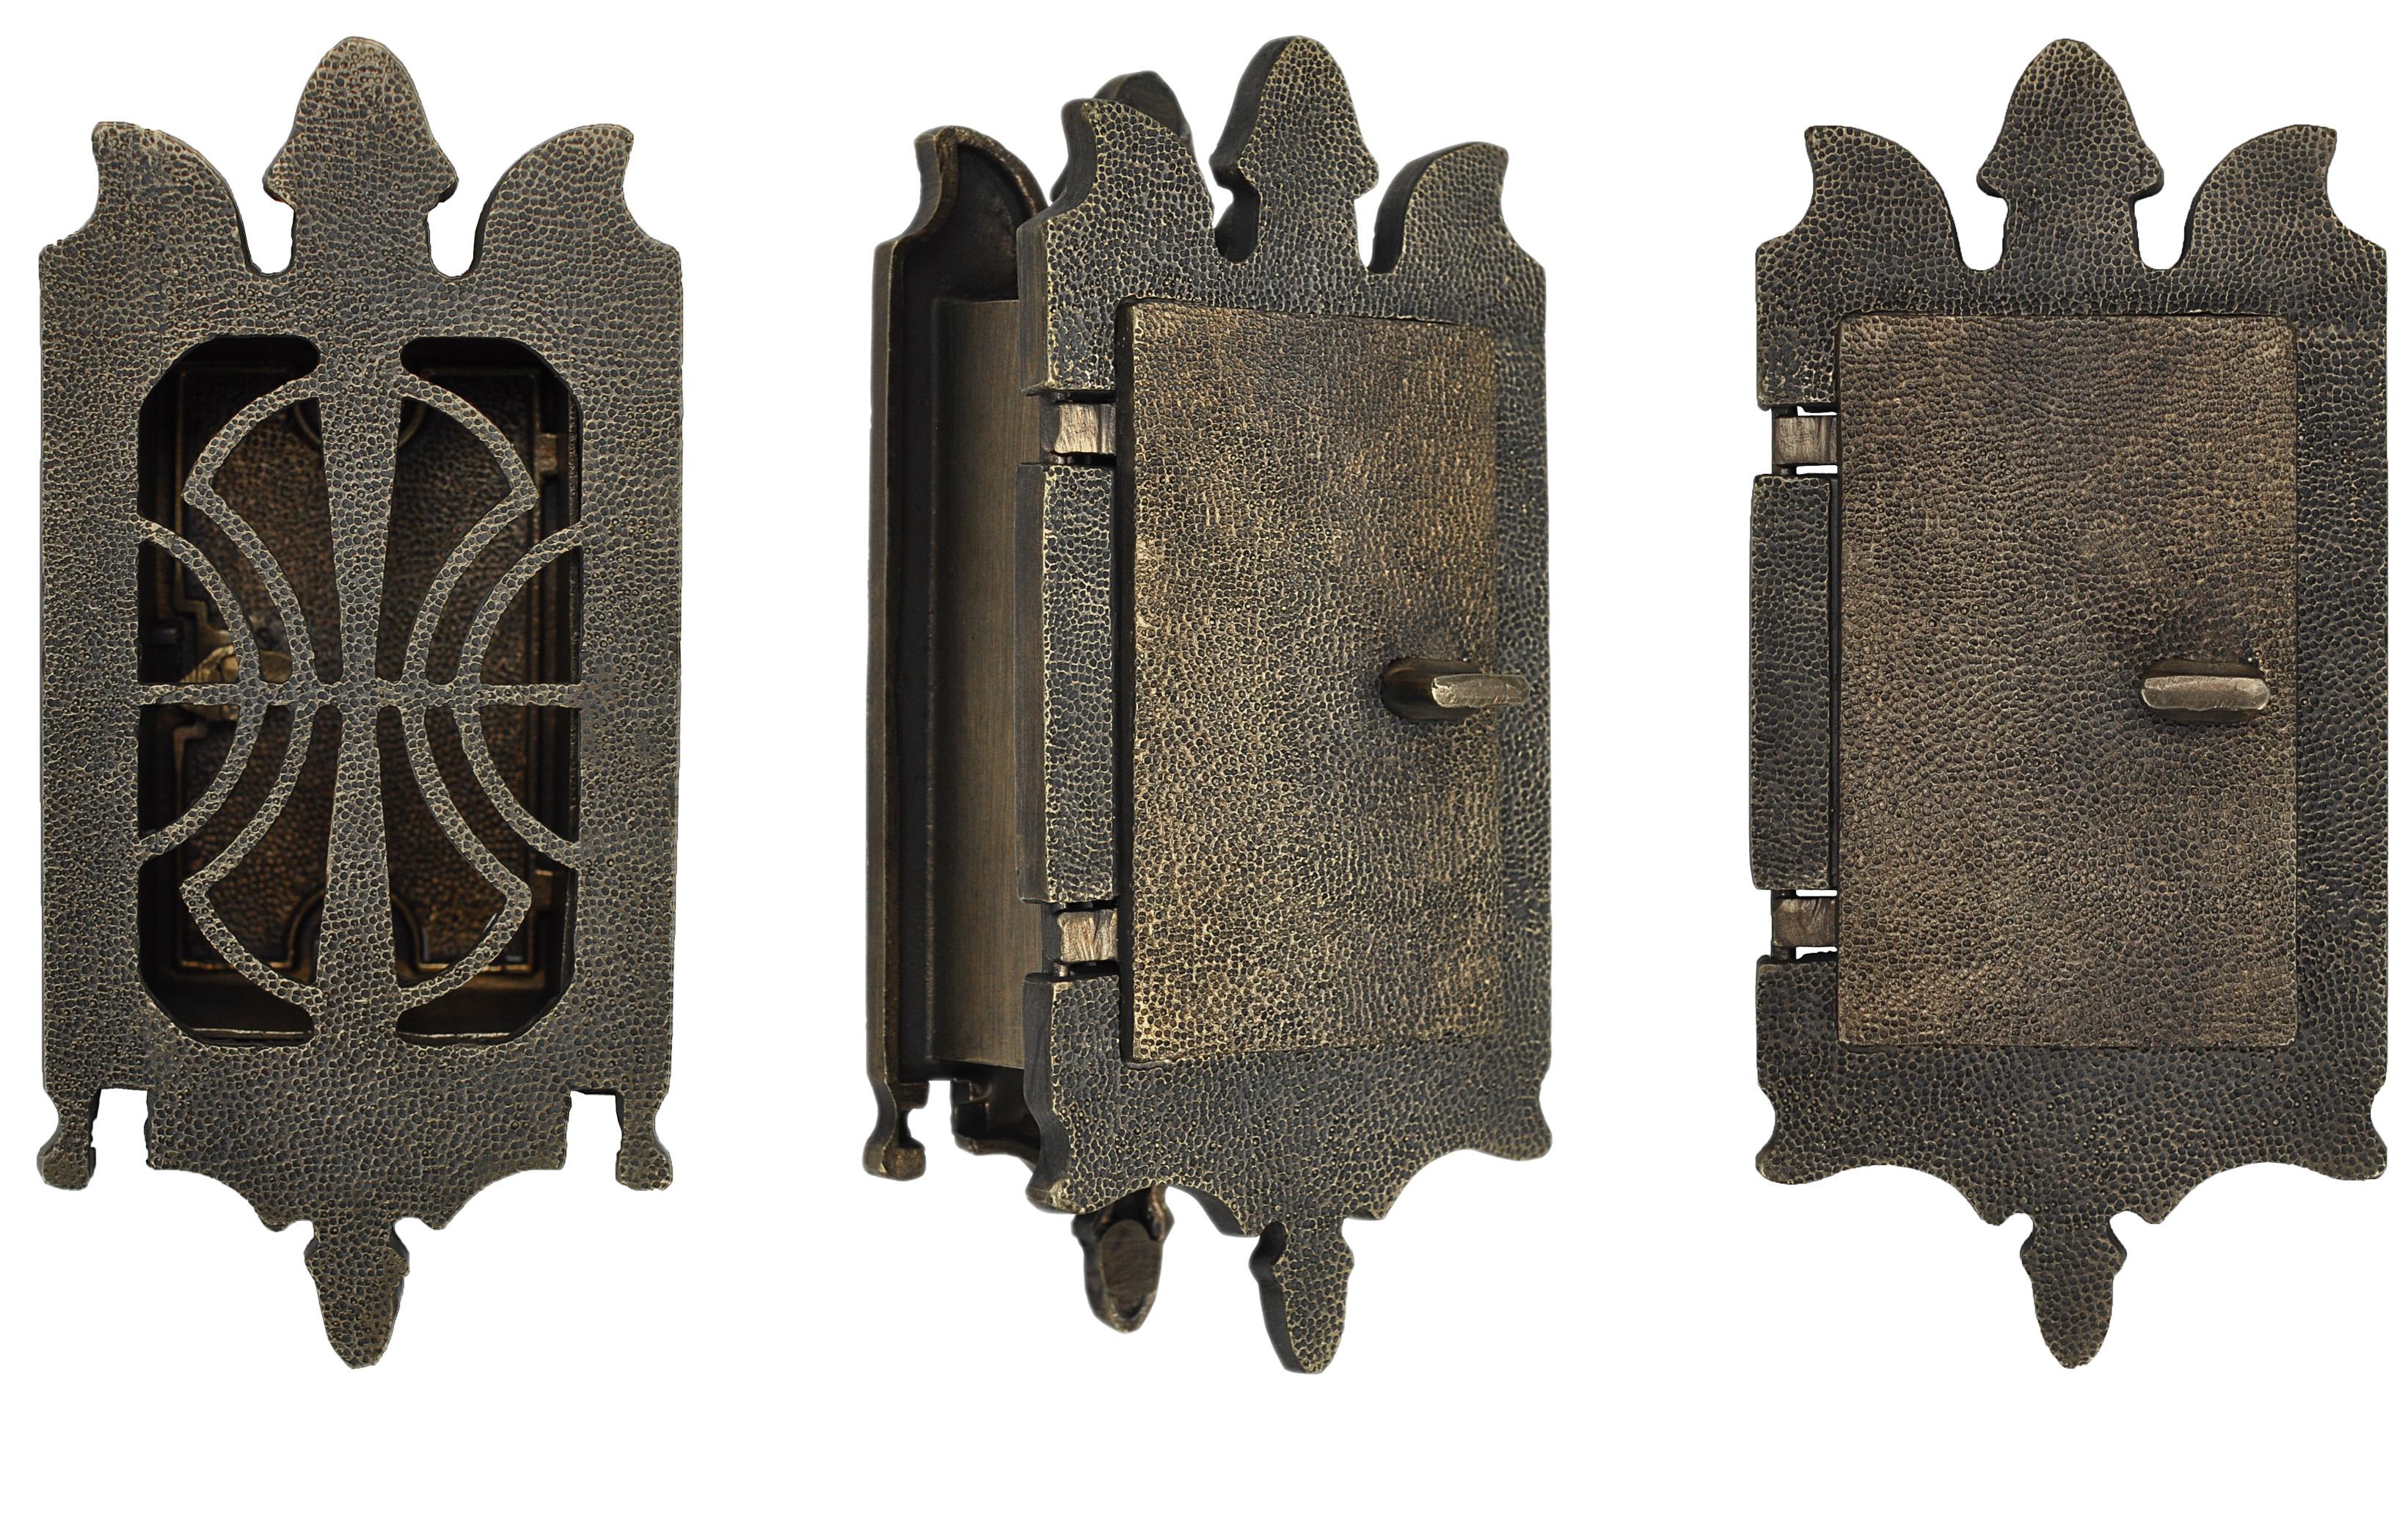 Small Art Nouveau Door Grille Or Speakeasy or Peephole Set (ZLW-DK334)